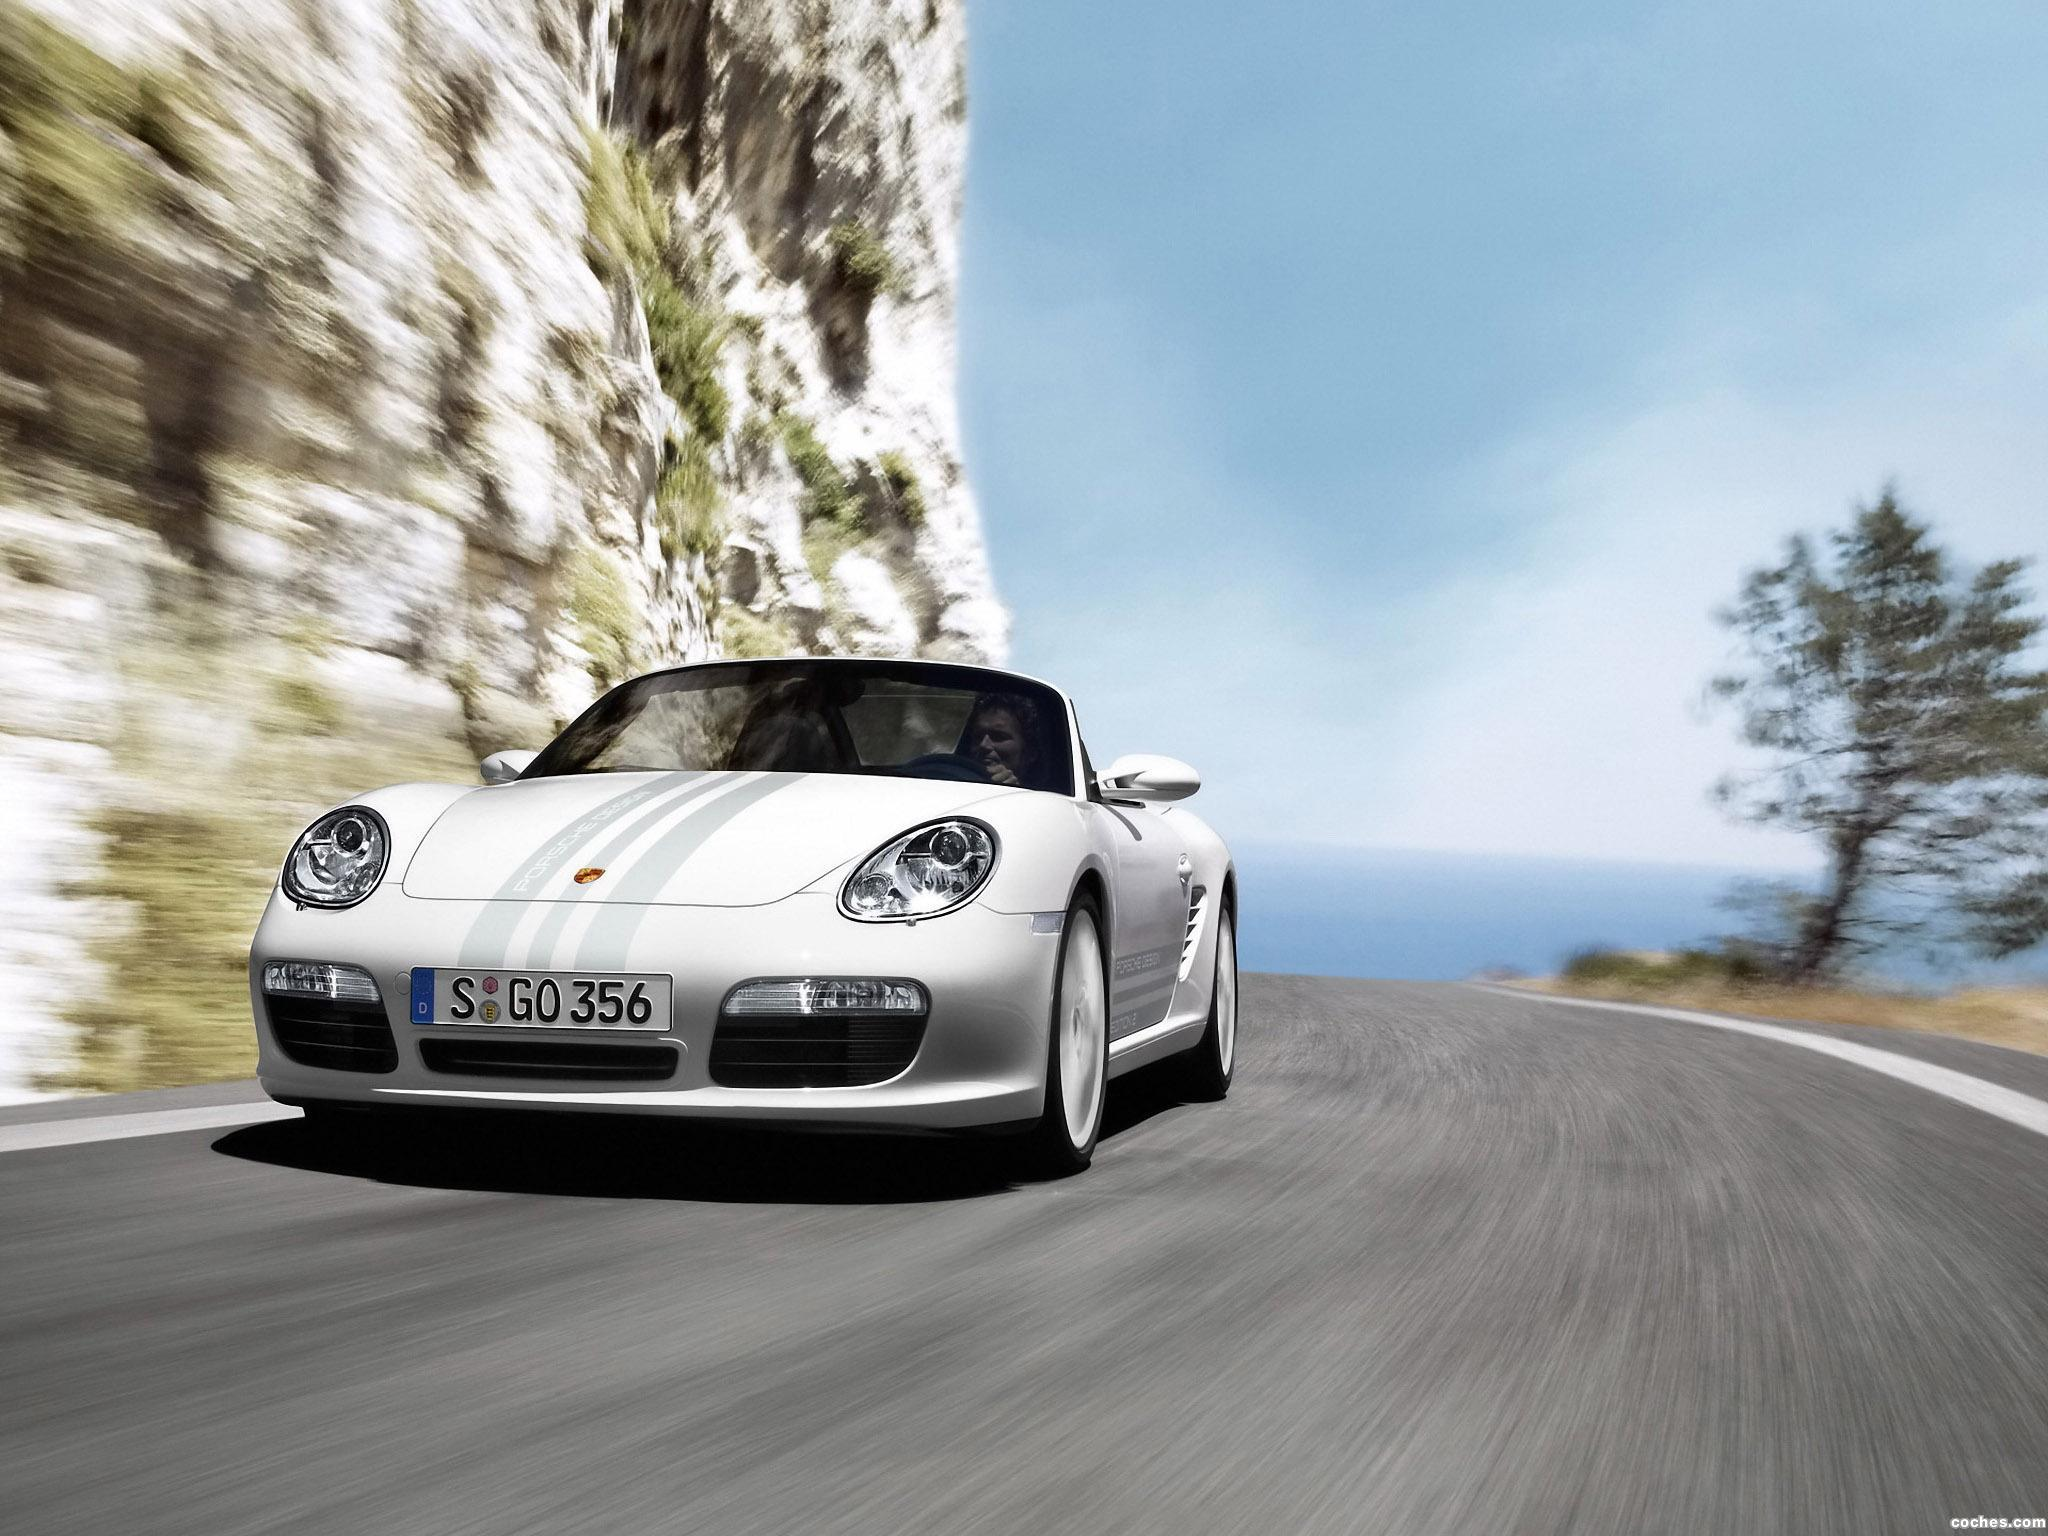 Foto 0 de Porsche Boxster S Design Edition 987 2008